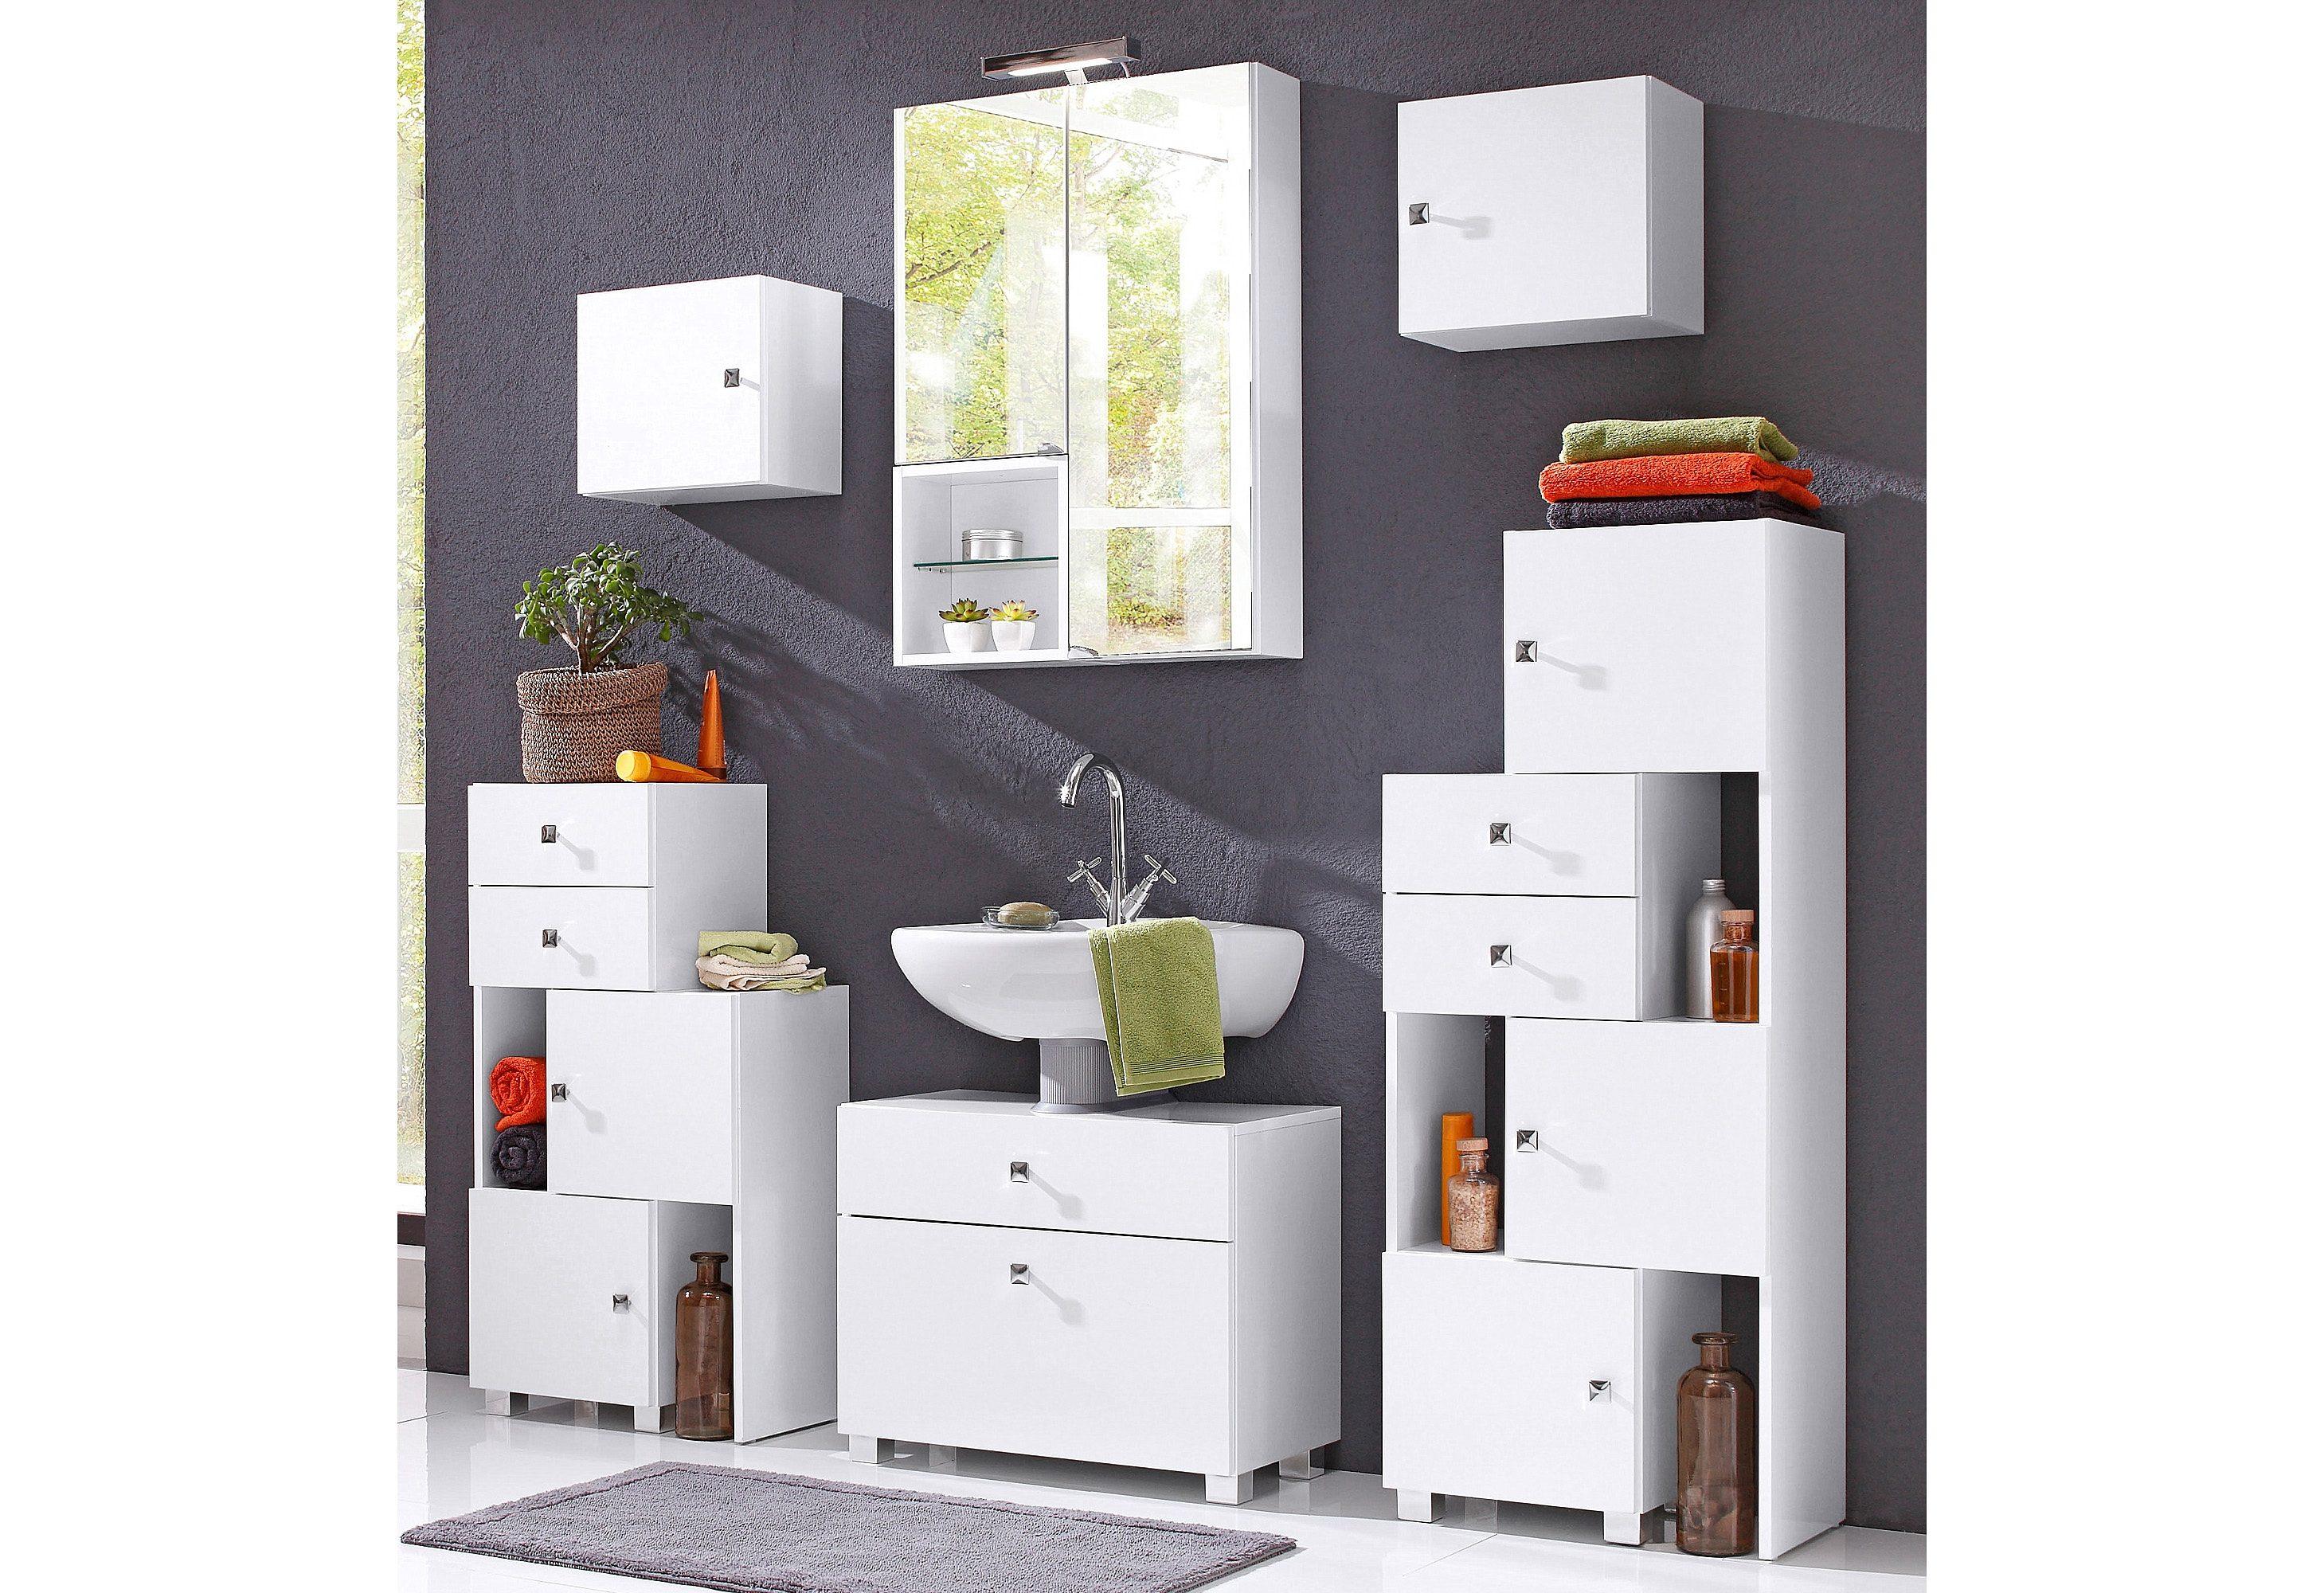 Wastafelkasten en badkamerkasten ikea